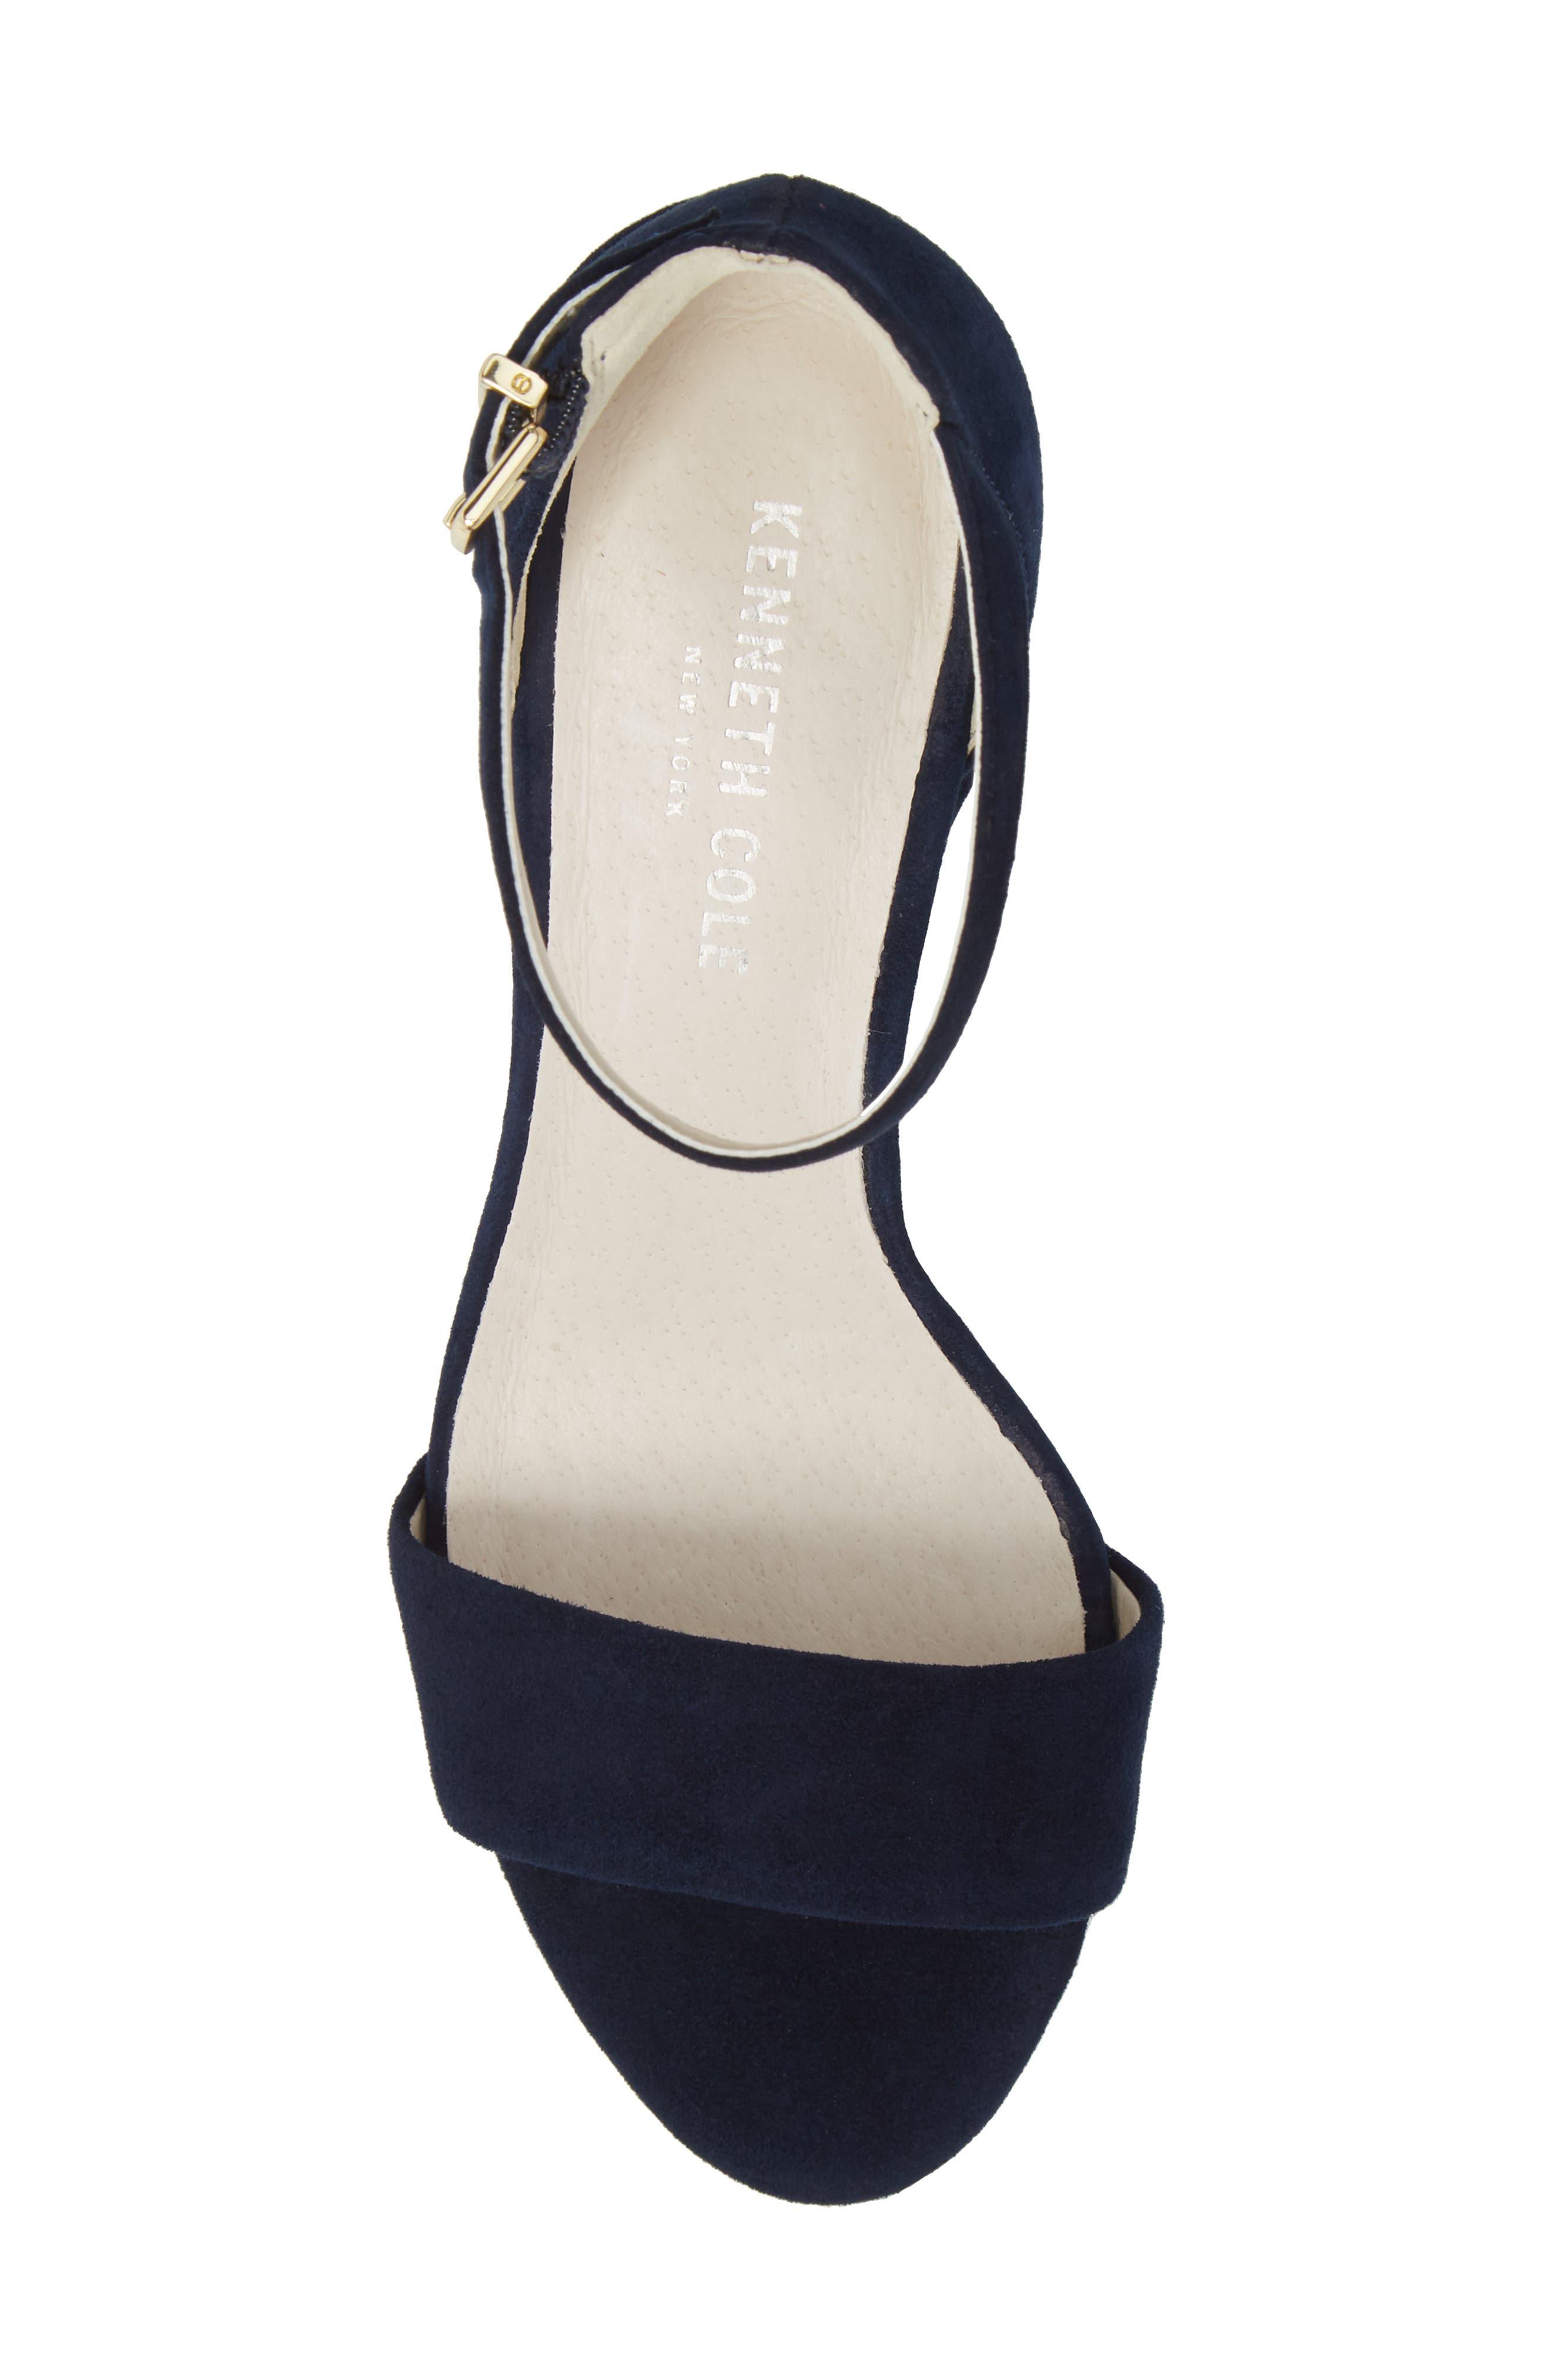 Hannon Block Heel Ankle Strap Sandal,                             Alternate thumbnail 5, color,                             Navy Suede